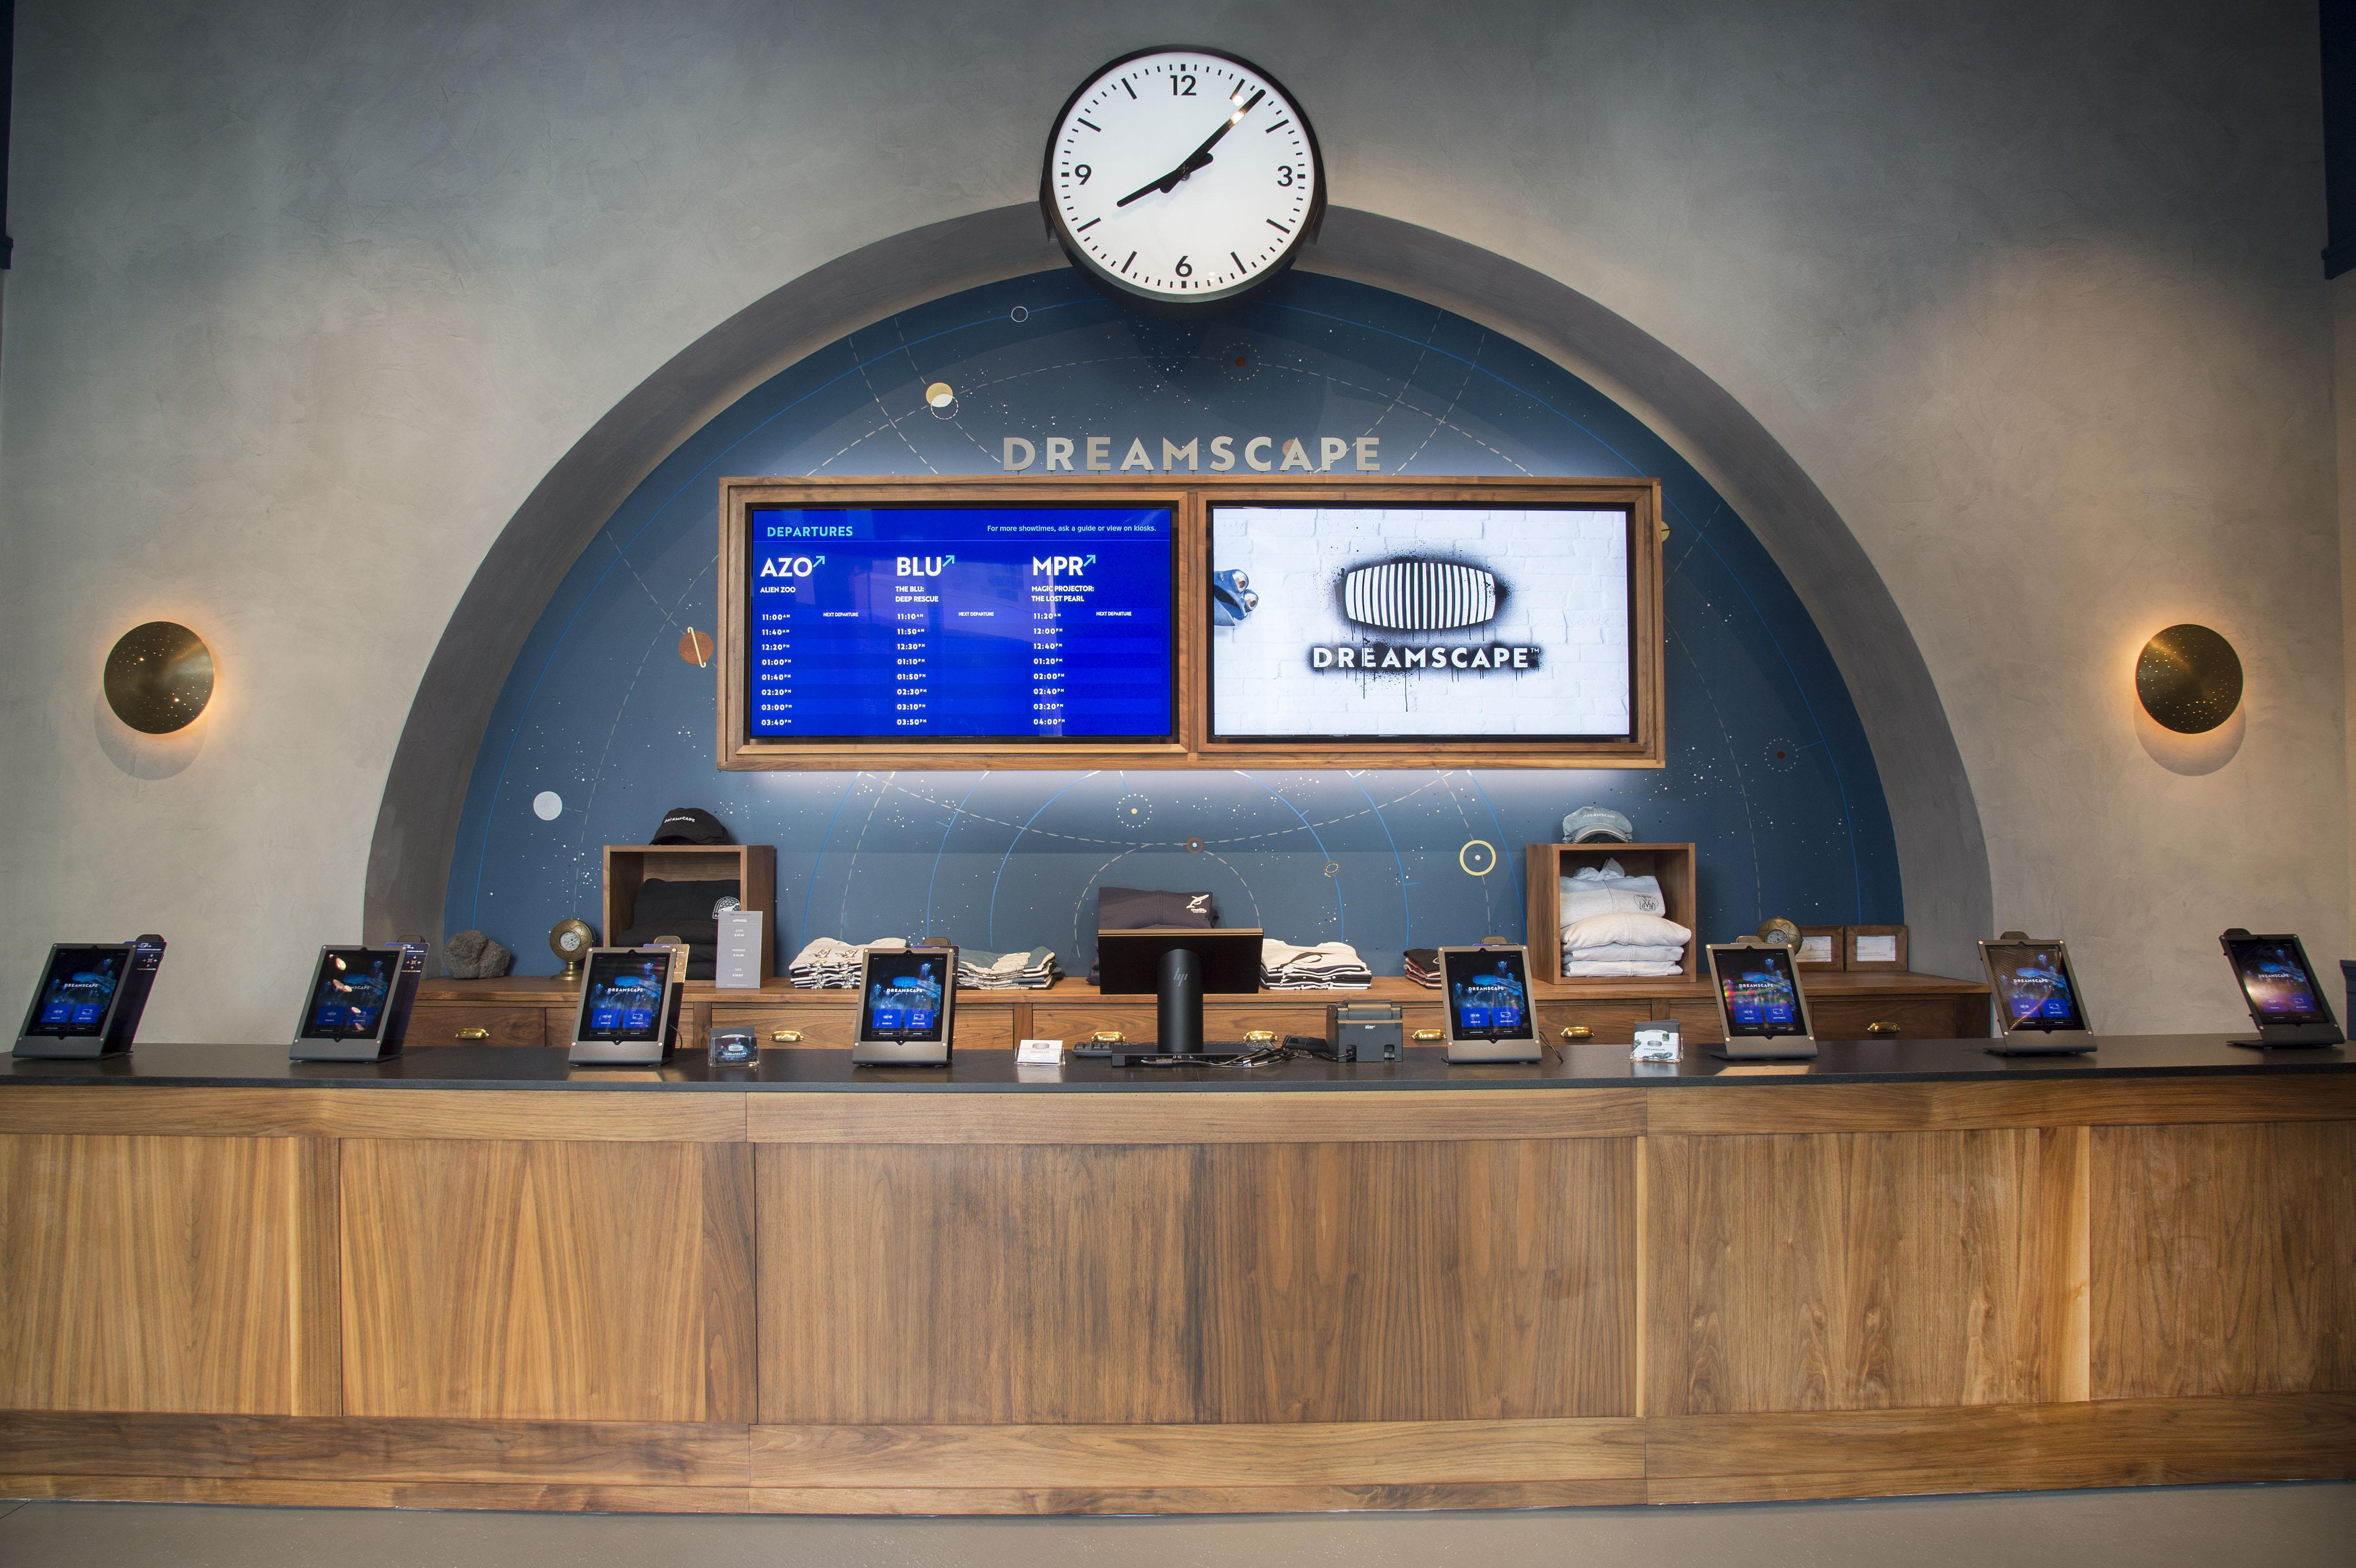 Dreamscape Brings VR Experiences to NorthPark Center - D